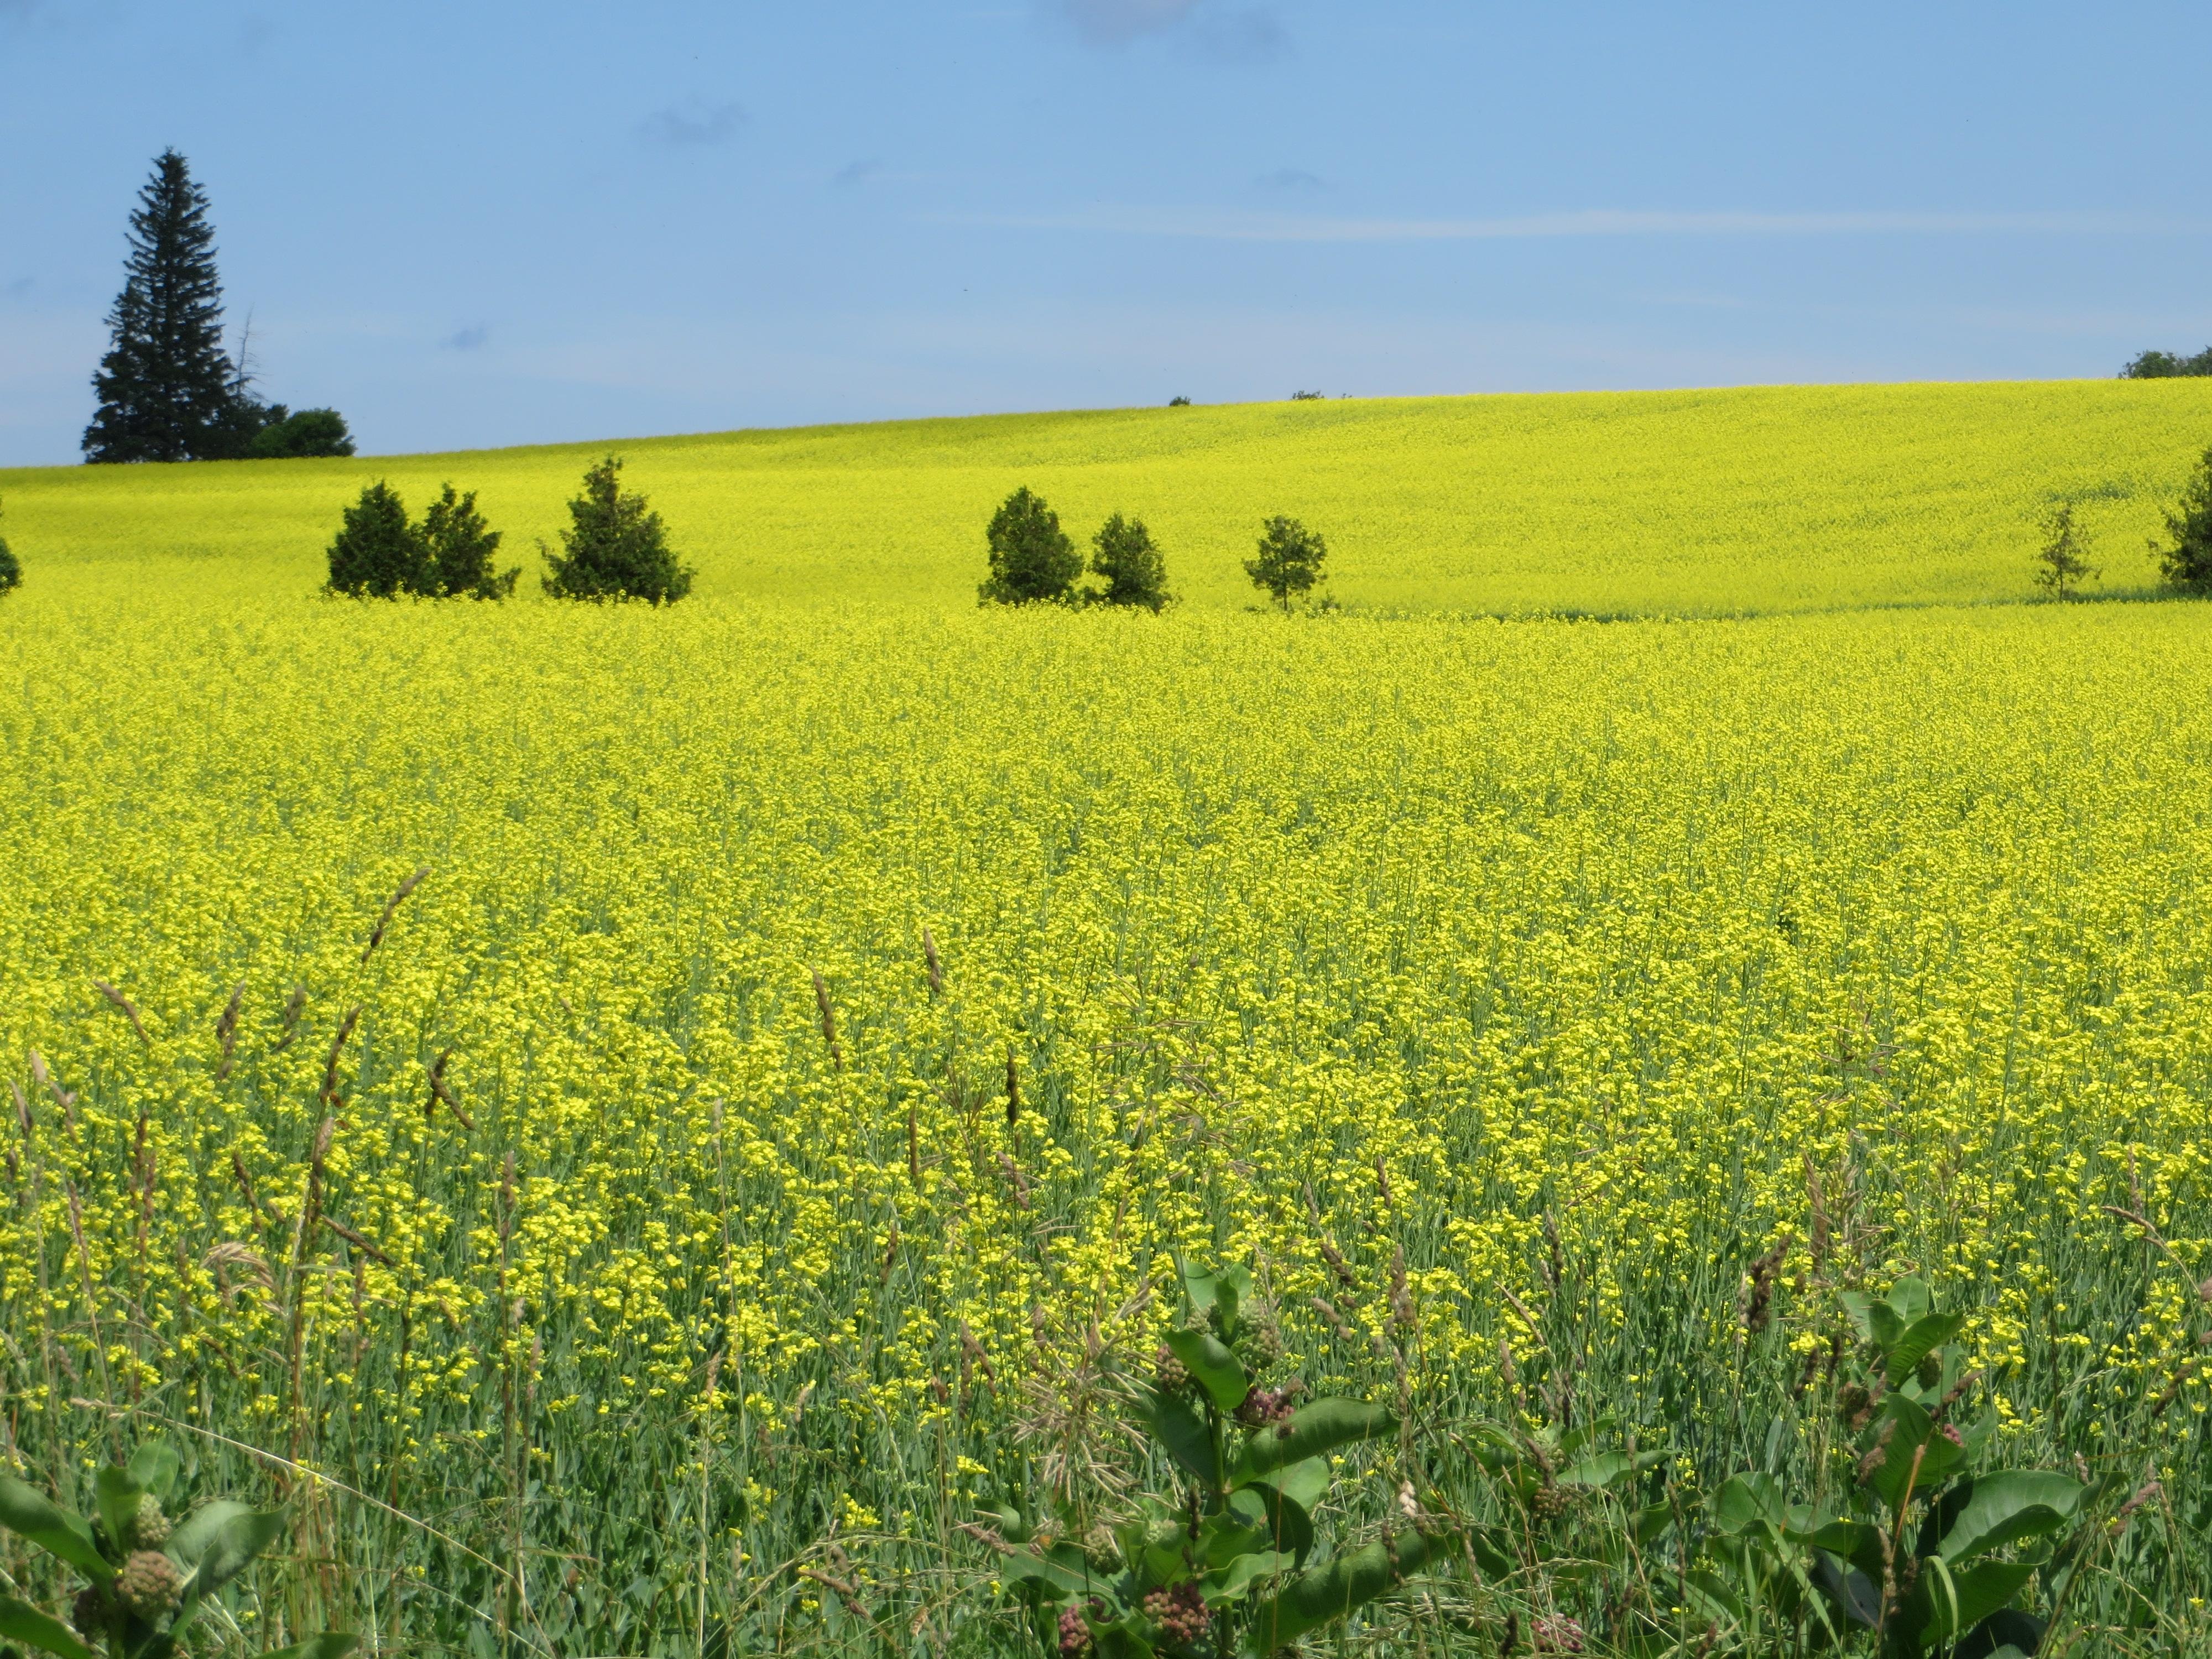 Field near Didsbury, AB